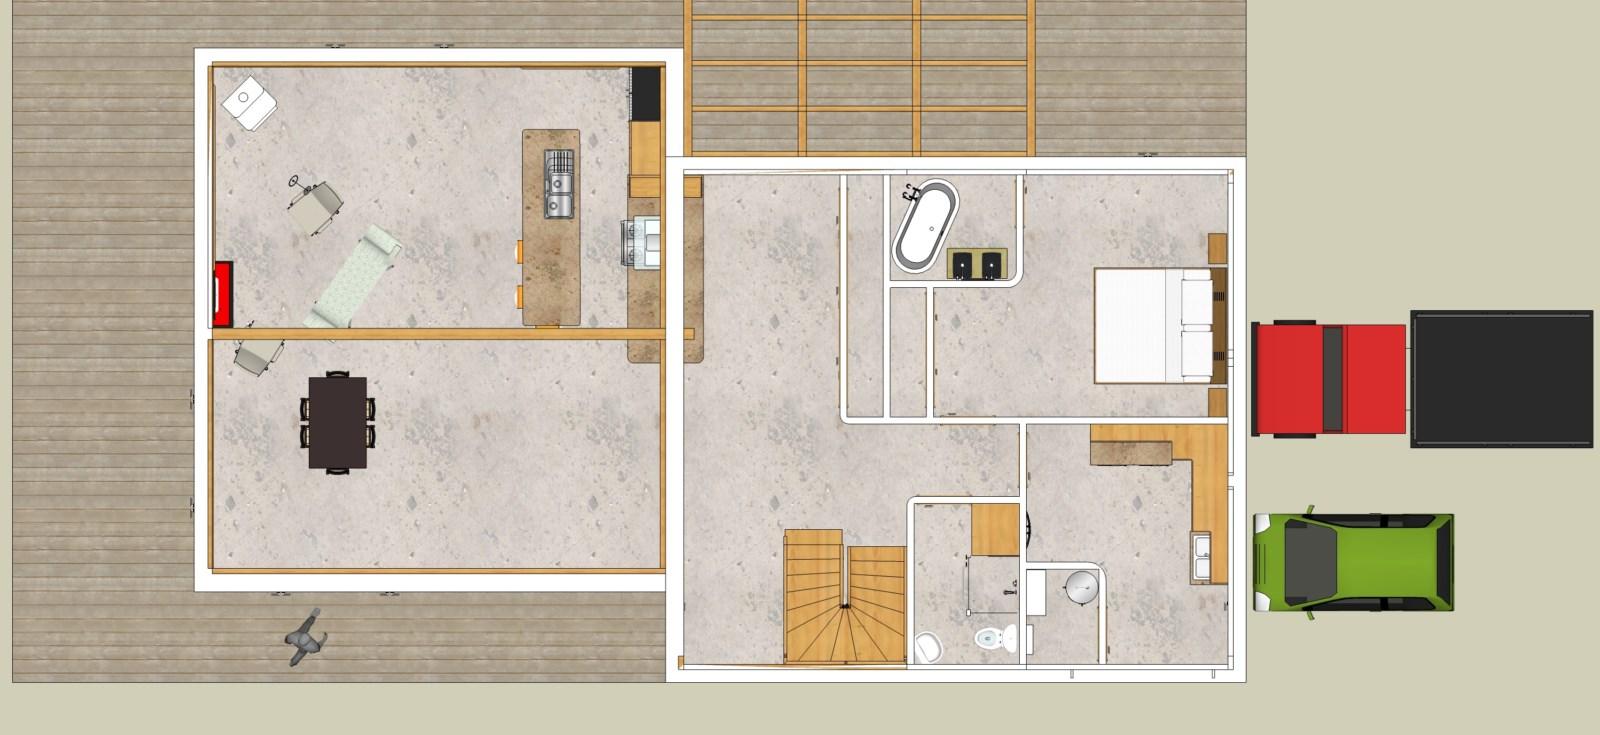 e-toit deux pentes 2 [1600x1200].jpg